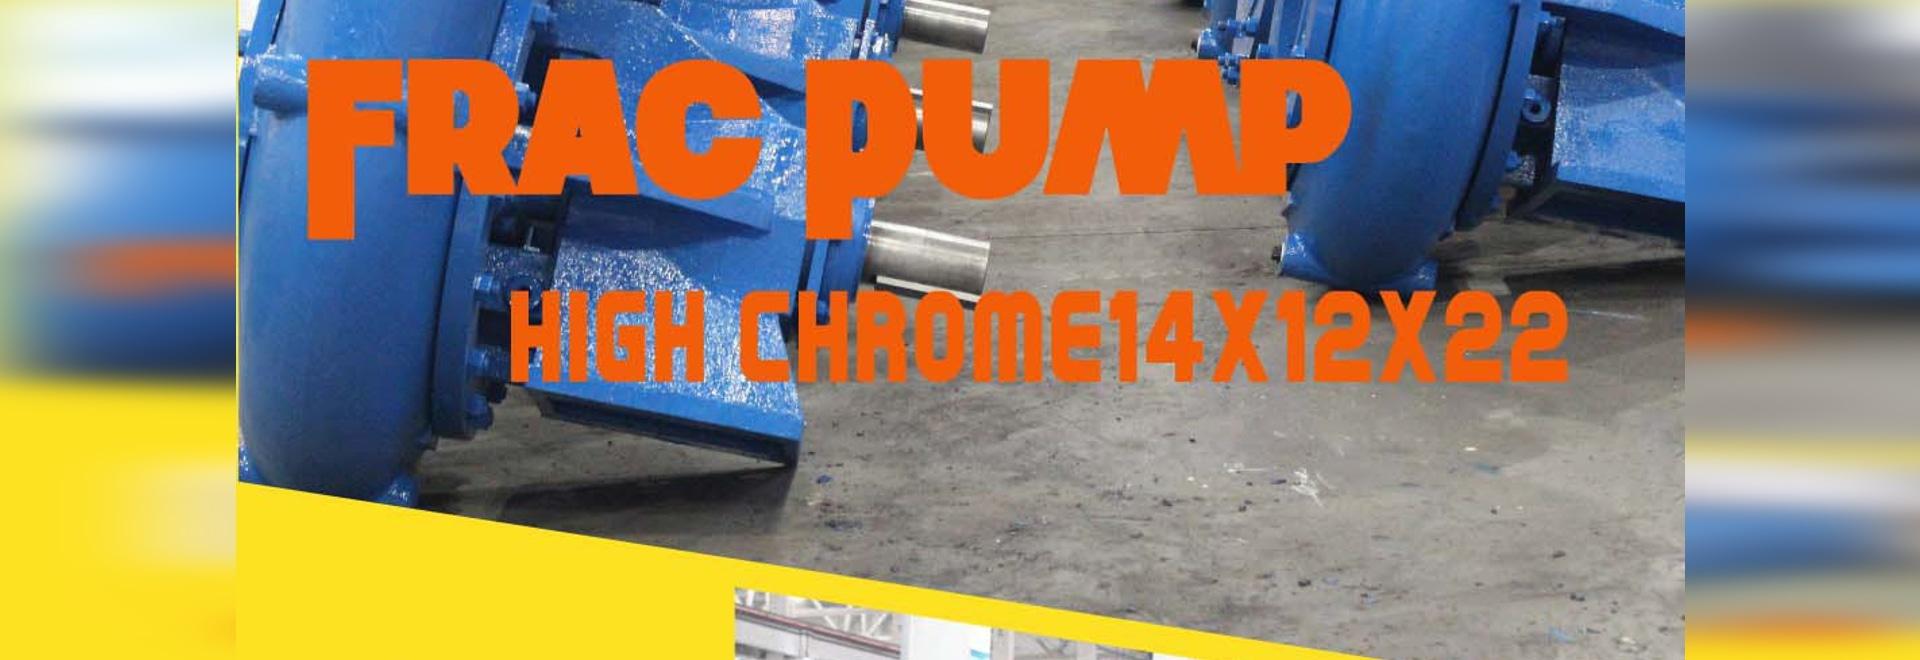 Pompe OEM 14x12x22x22